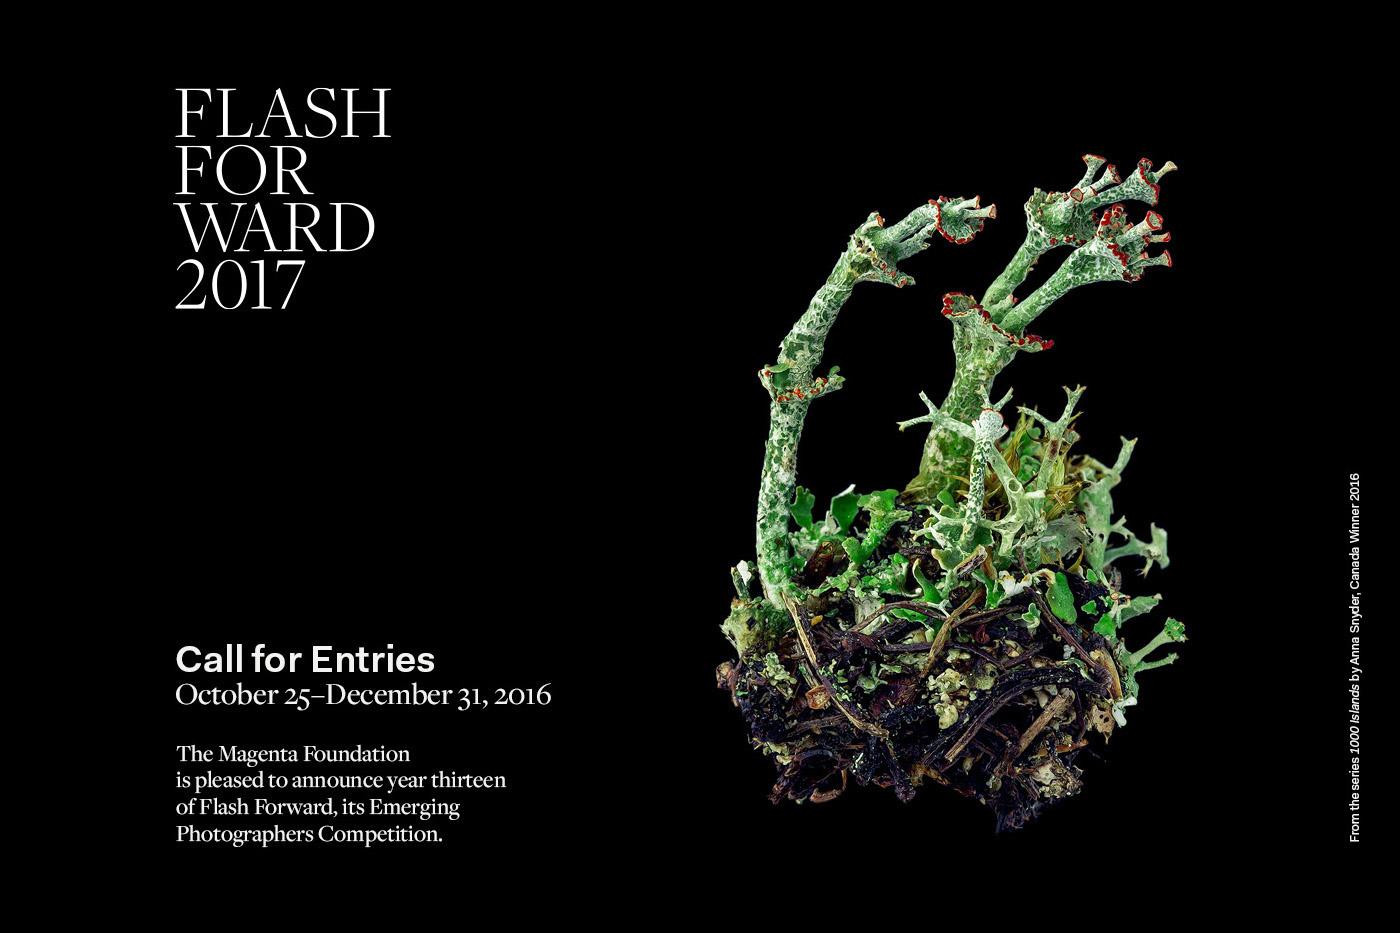 flashforward2017-callforsubmissions-promo